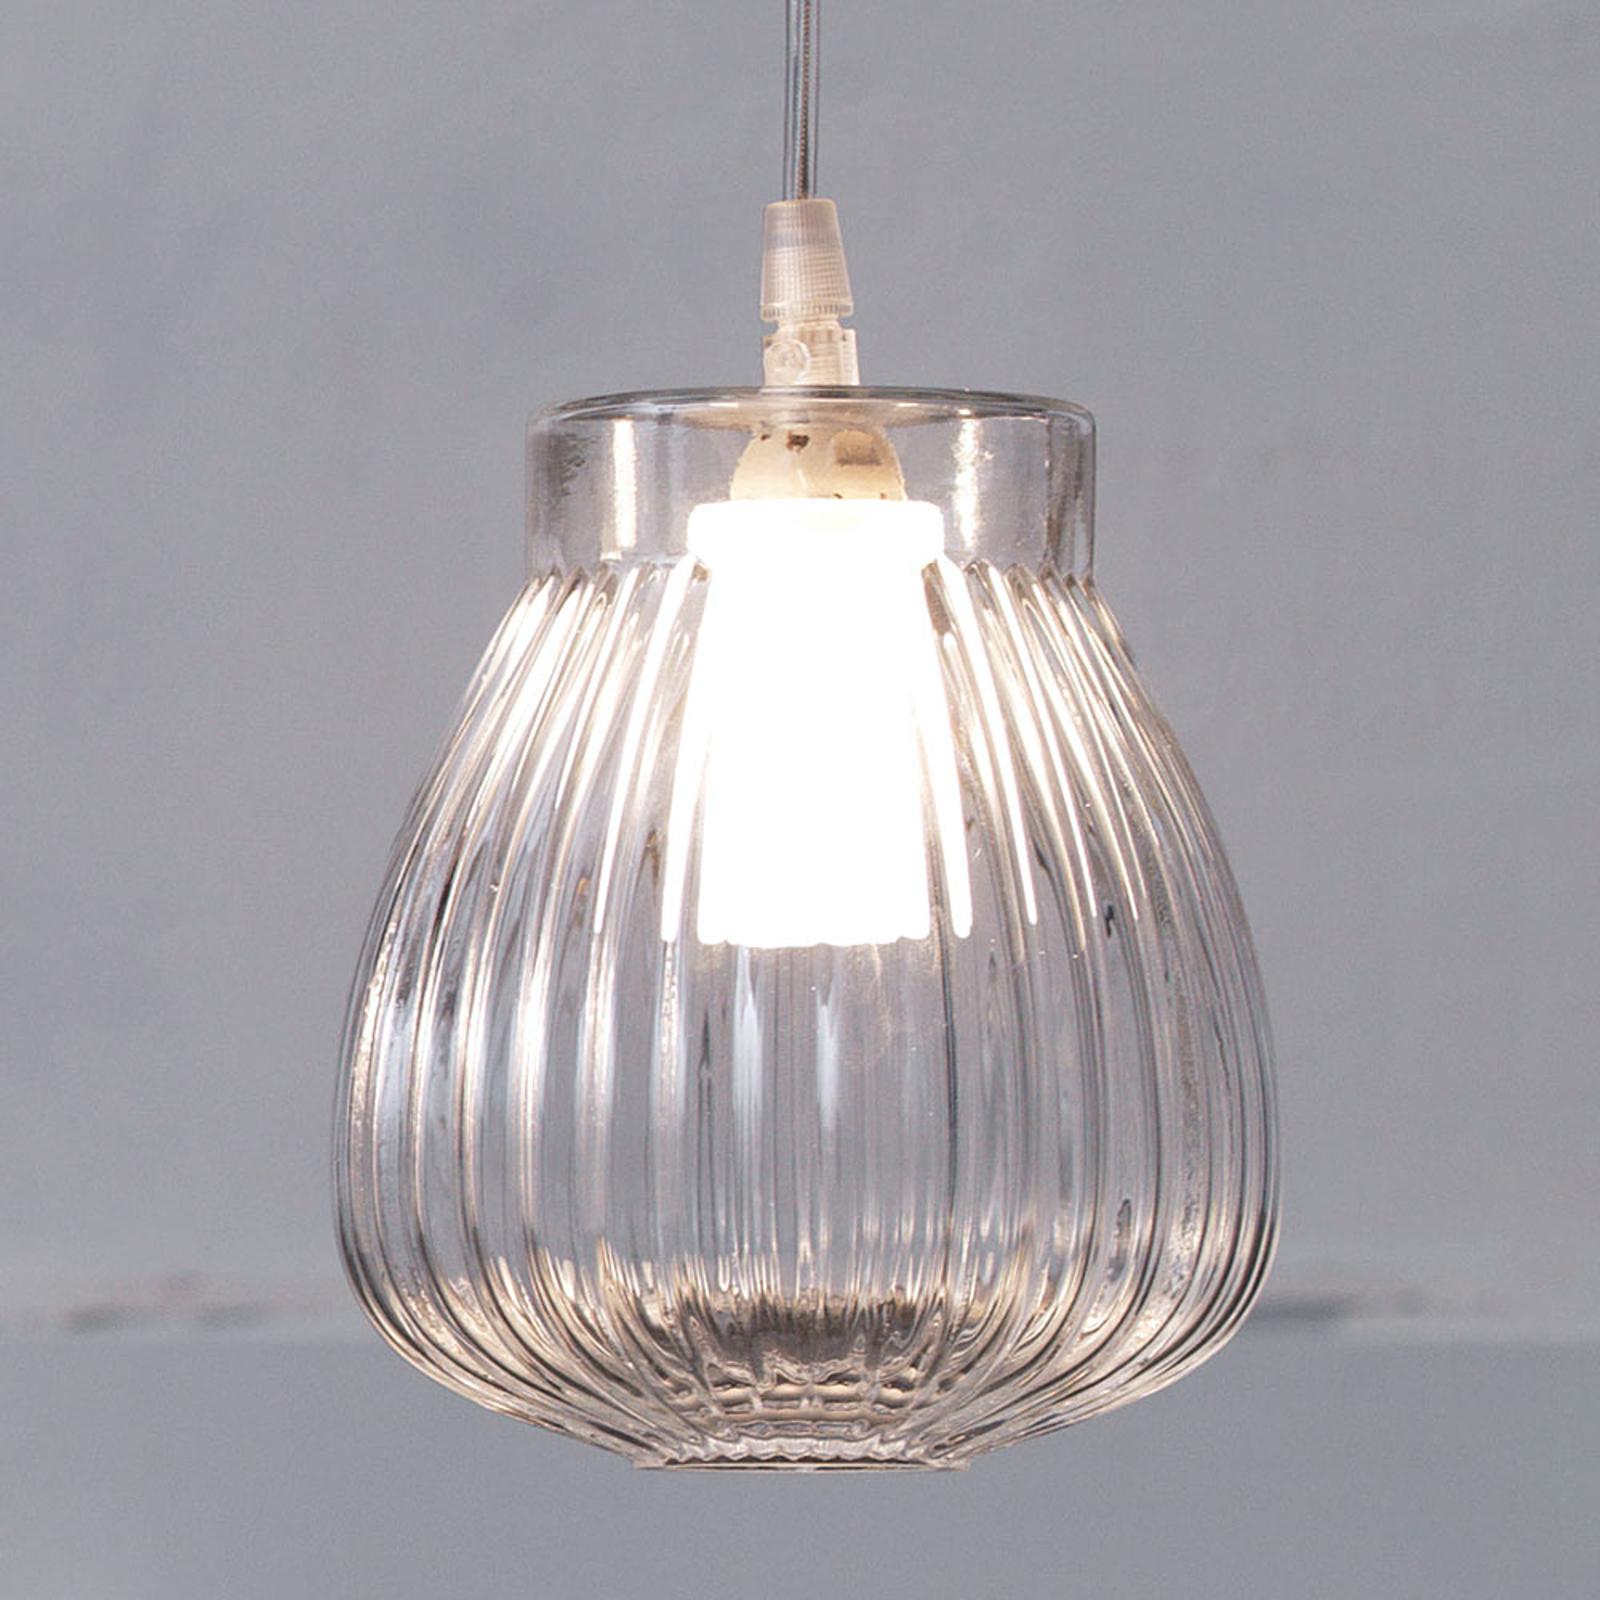 Karman Ceraunavolta - hanglamp met glazen kap